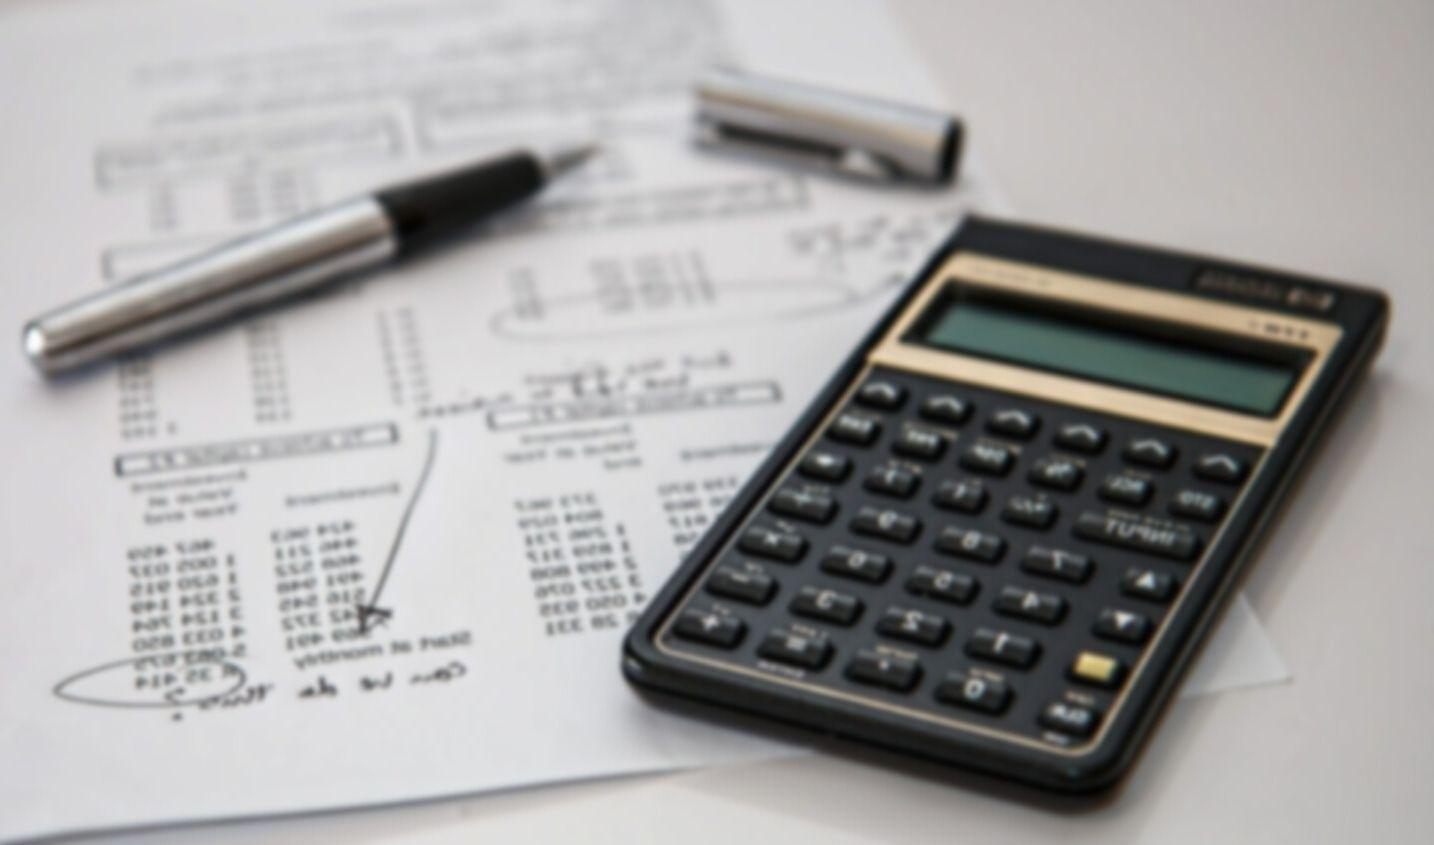 ACSP informa: Impostômetro ultrapassa marca de R$2 trilhões